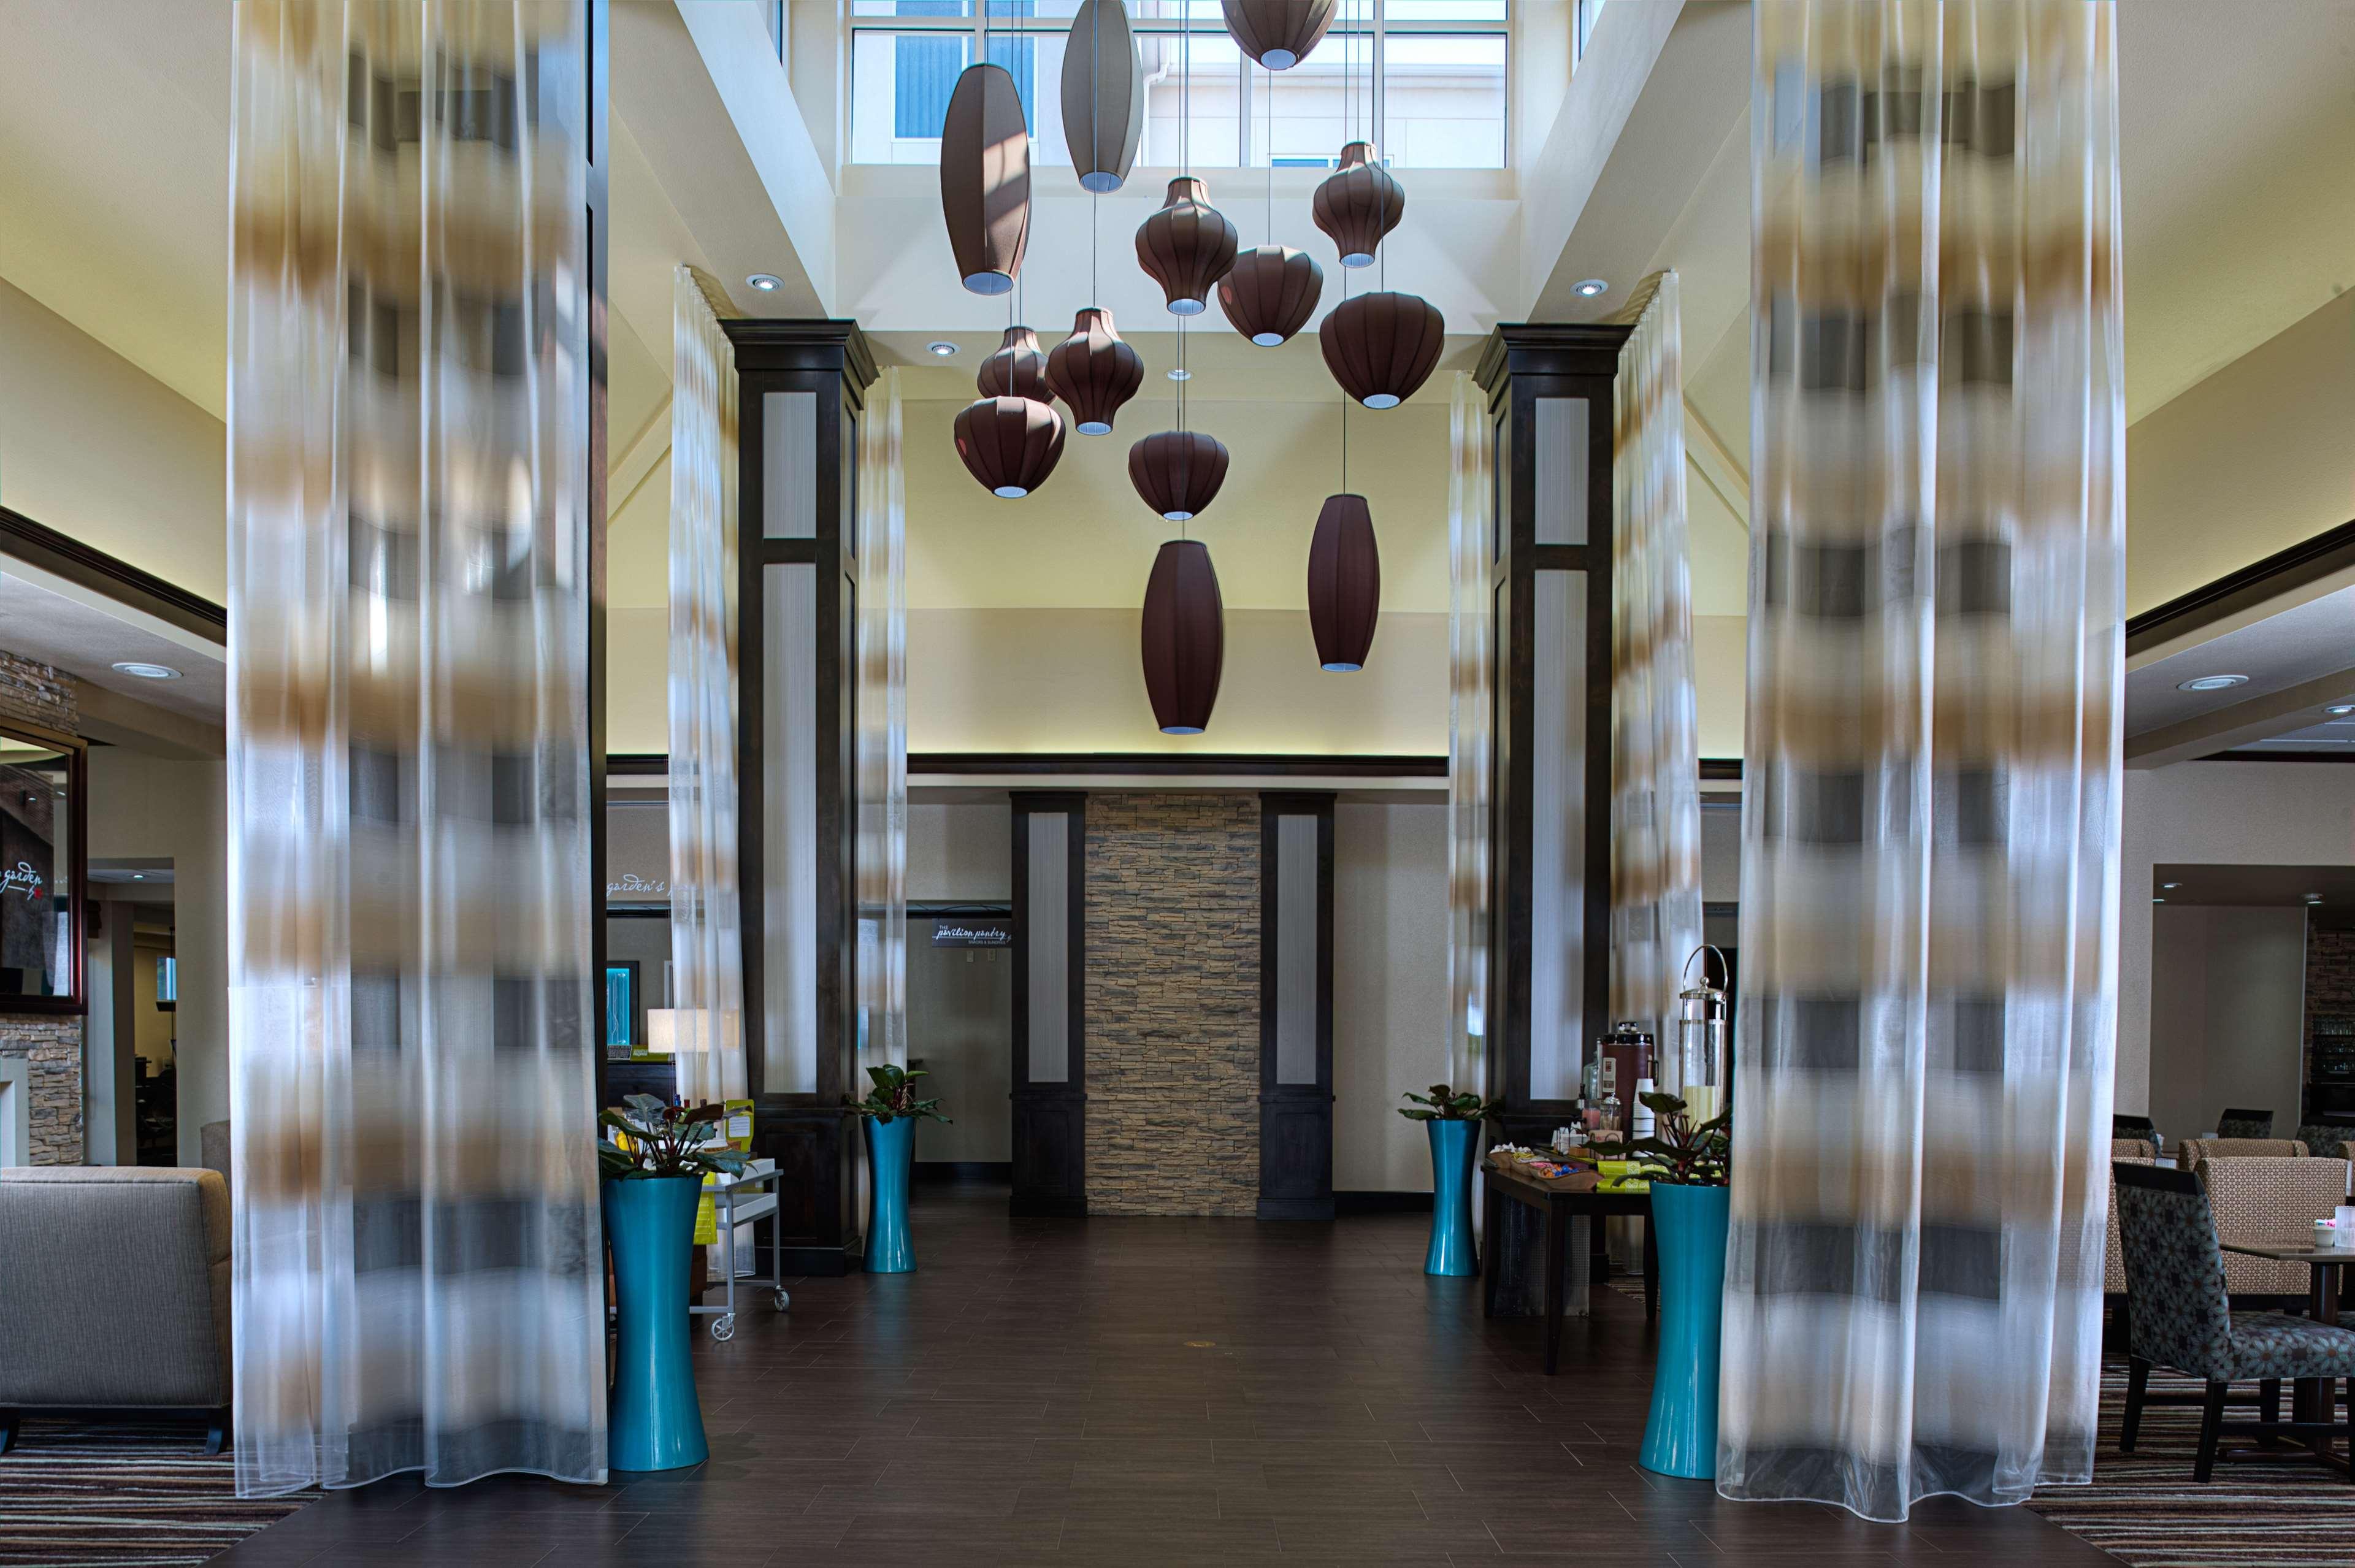 Hilton Garden Inn DFW Airport South image 10